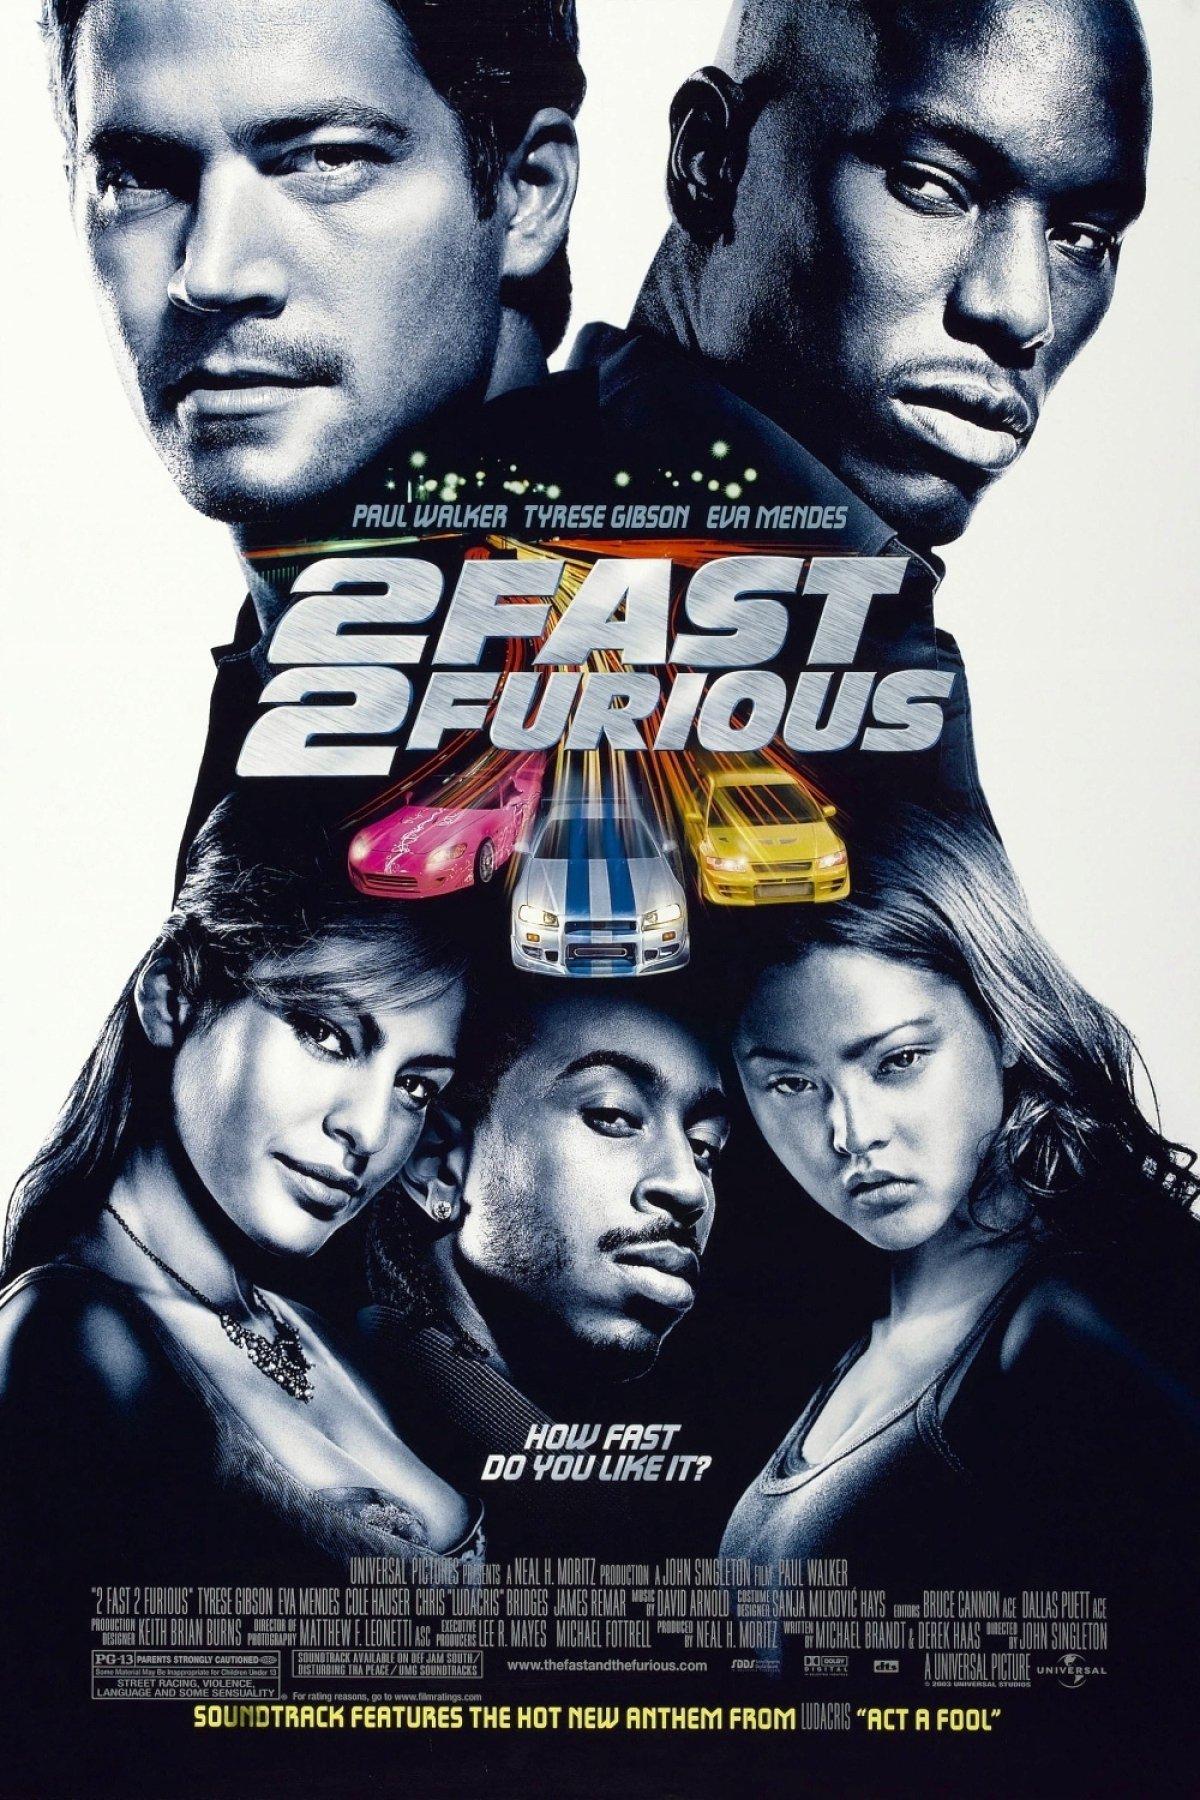 2 Fast 2 Furious (2003) BluRay 480p, 720p & 1080p